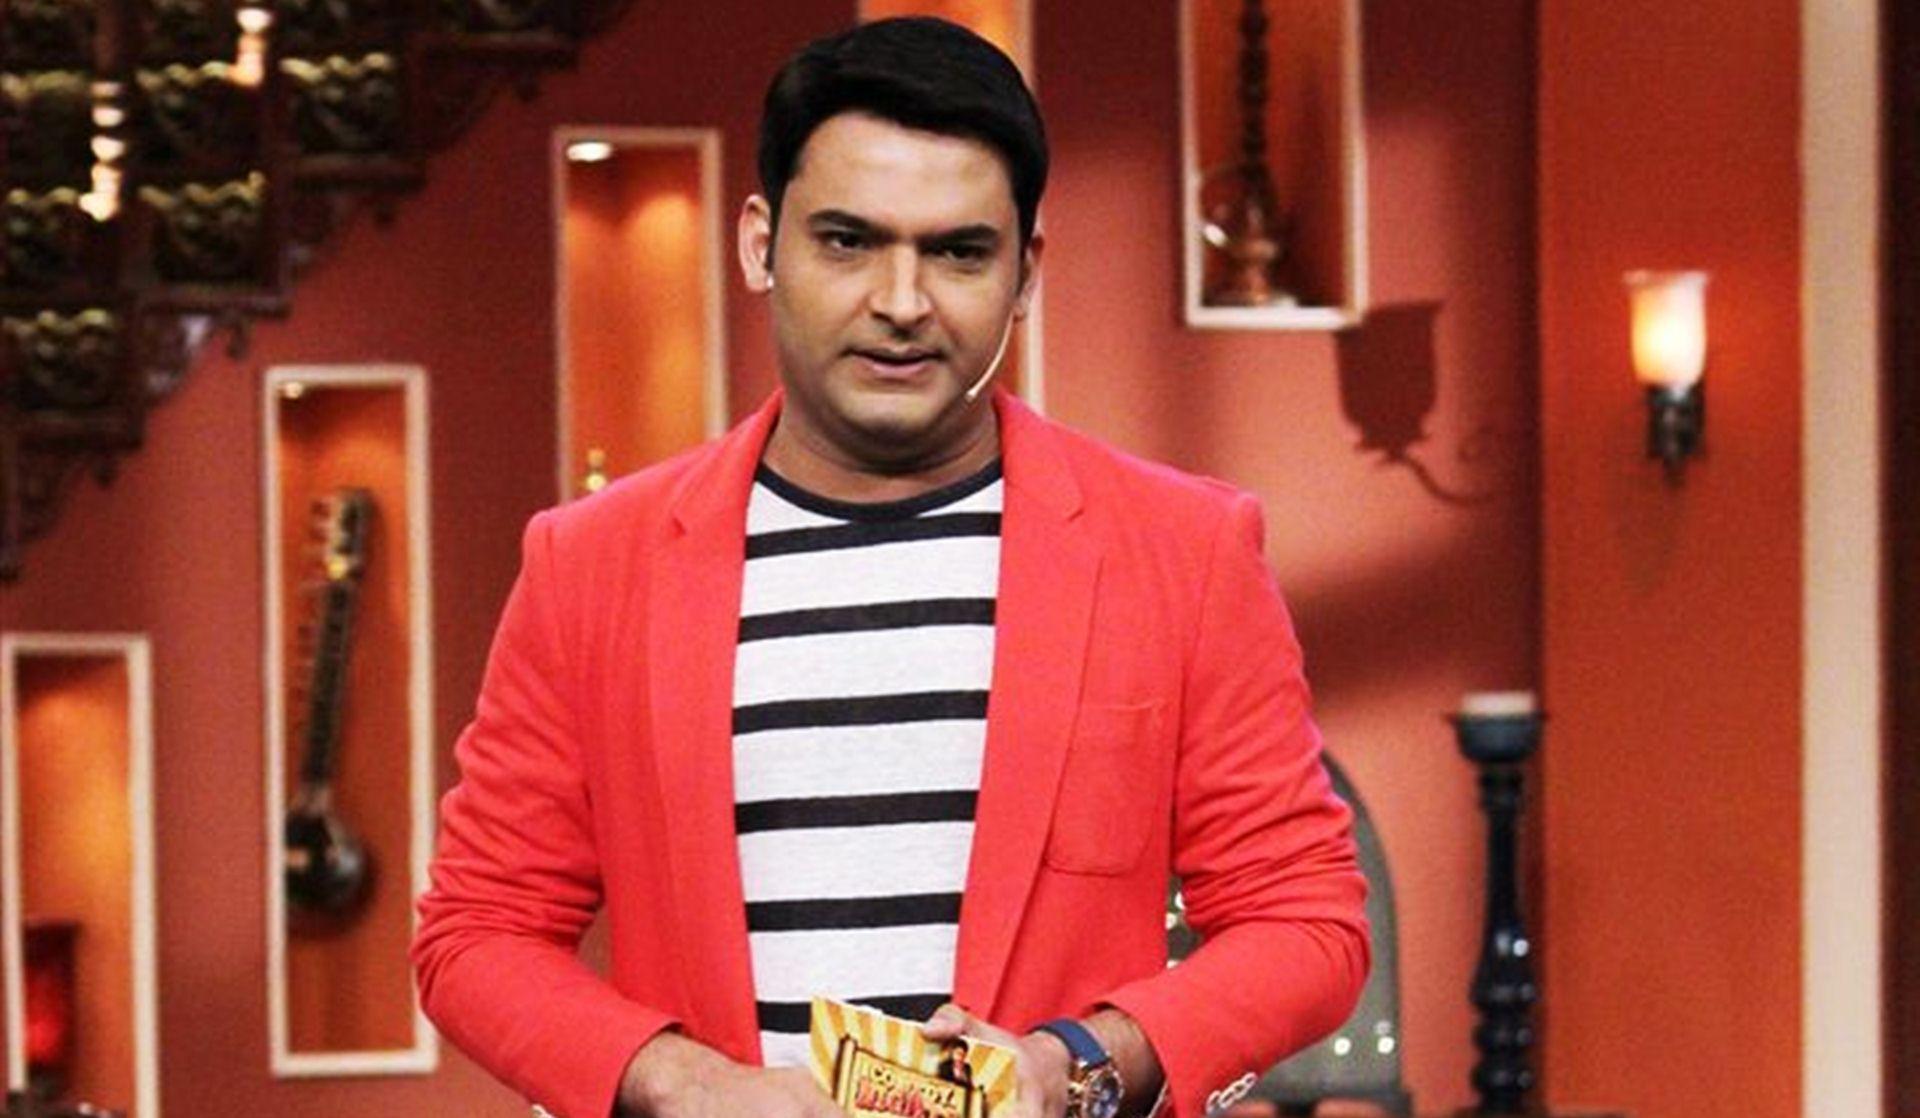 Kapil Sharma to get Dadasaheb Phalke Academy Award for the second time